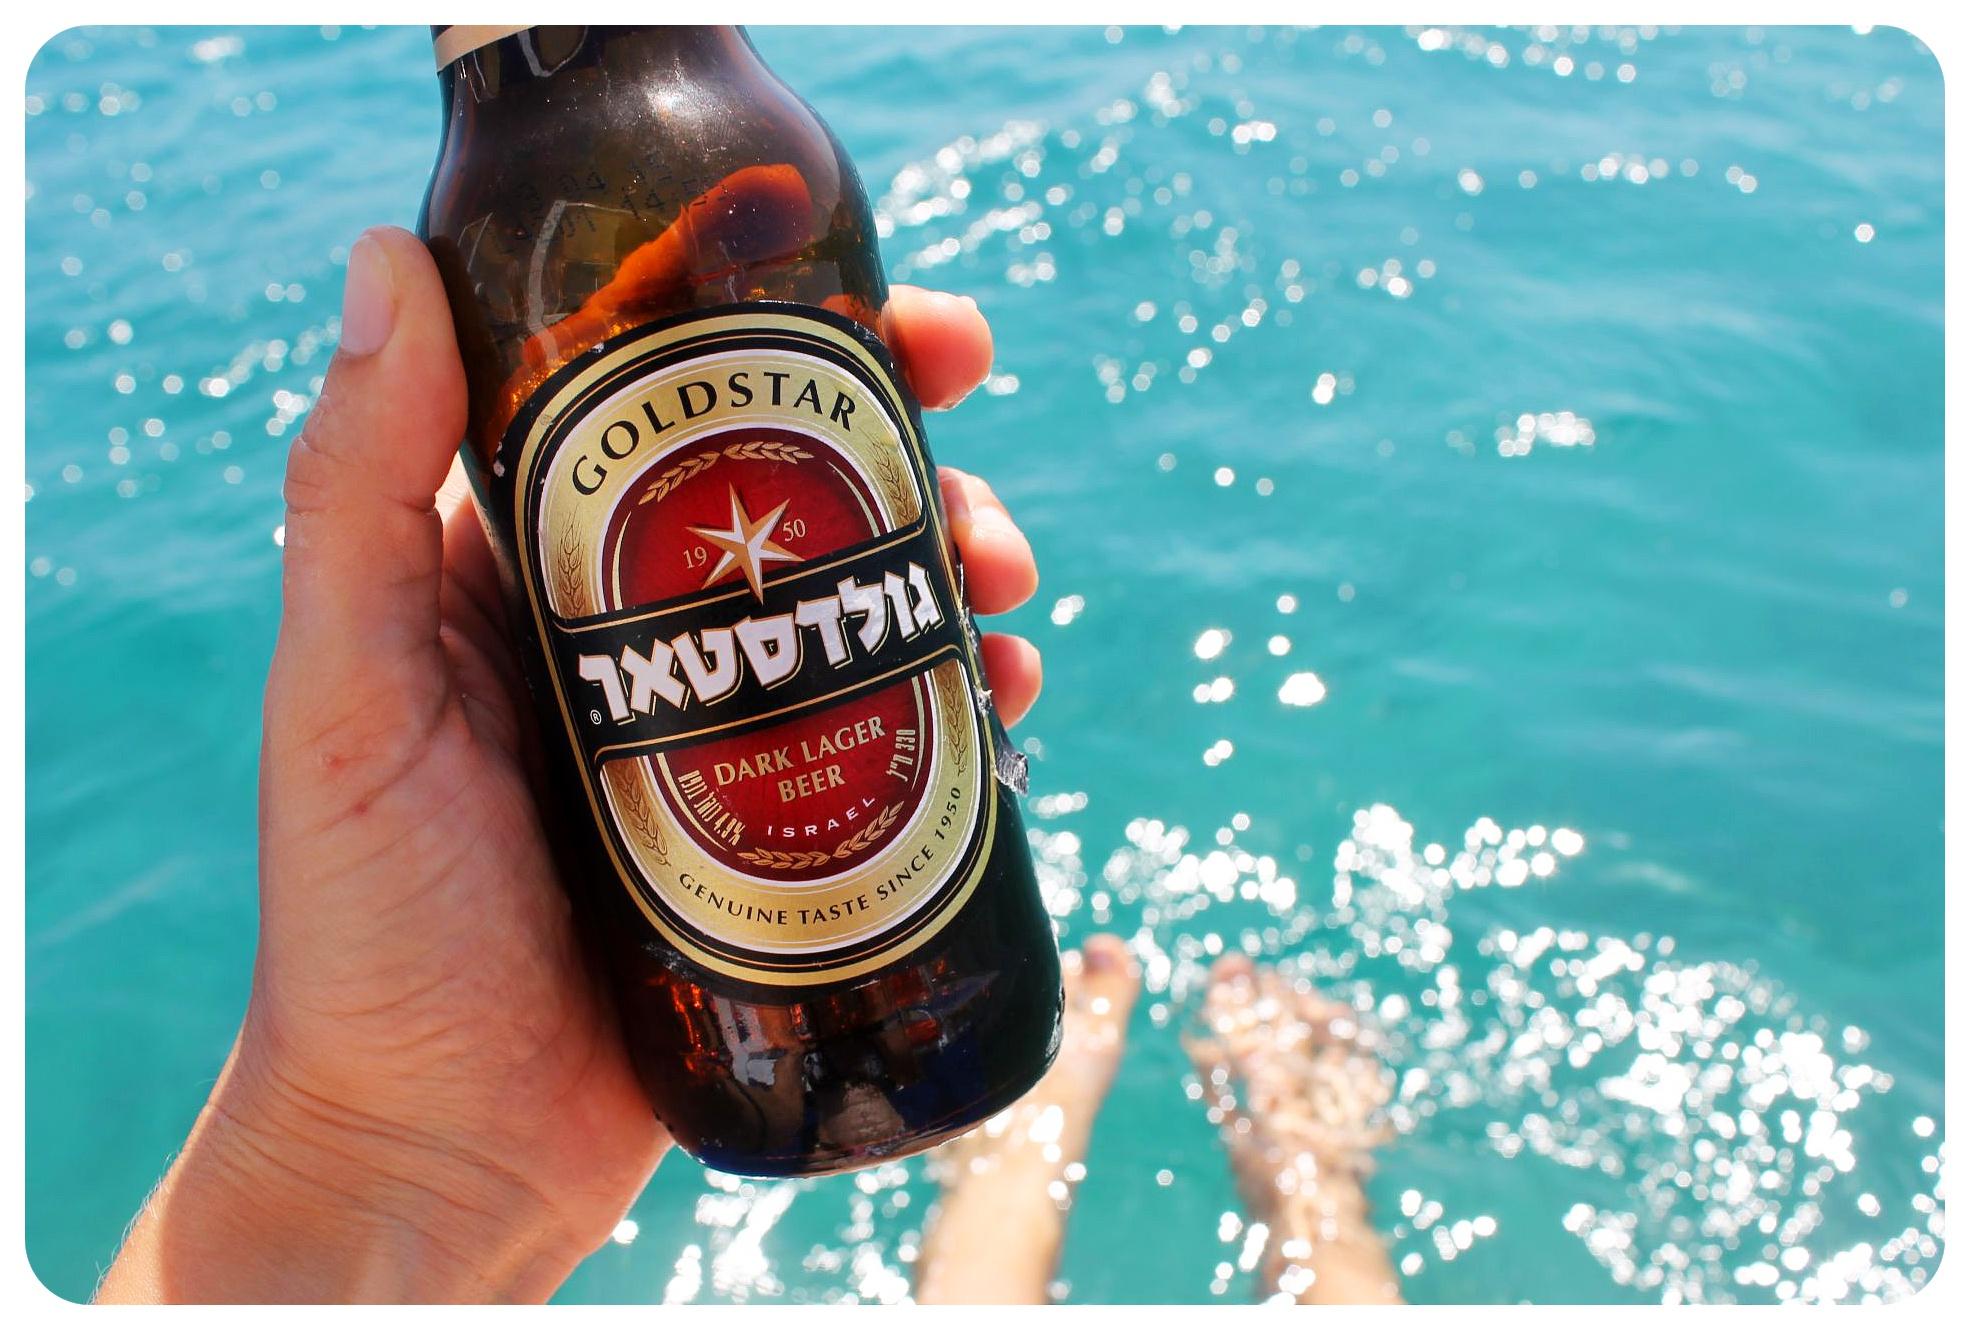 gold star israeli beer